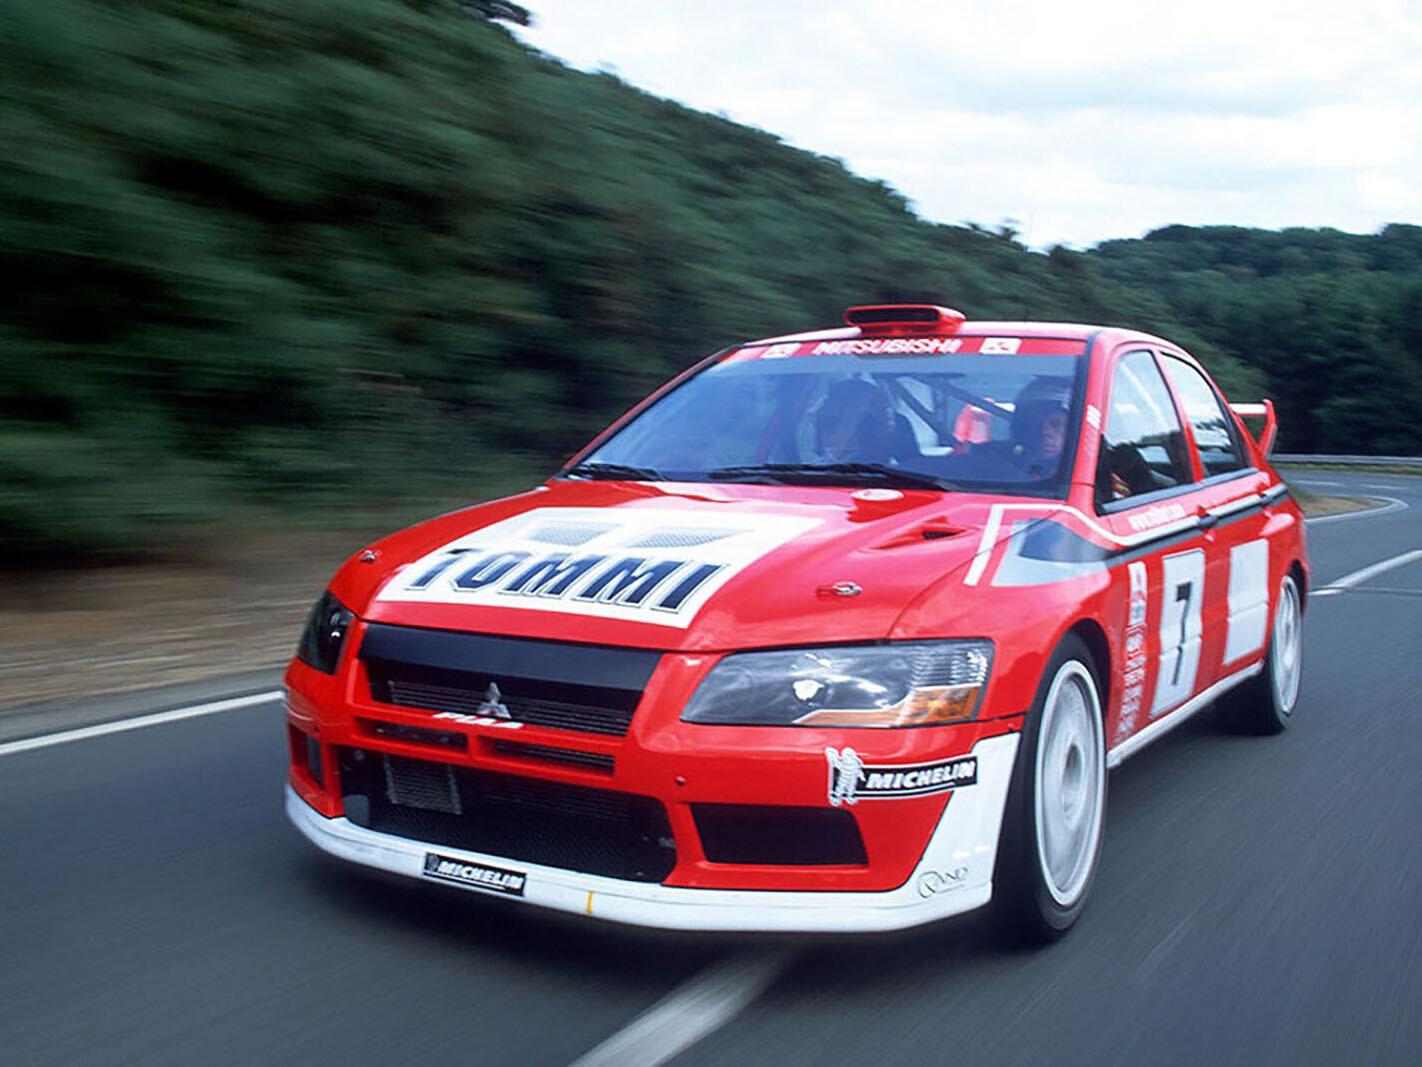 Mitsubishi Lancer Evolution Vii Wrc 32 Web Jpg